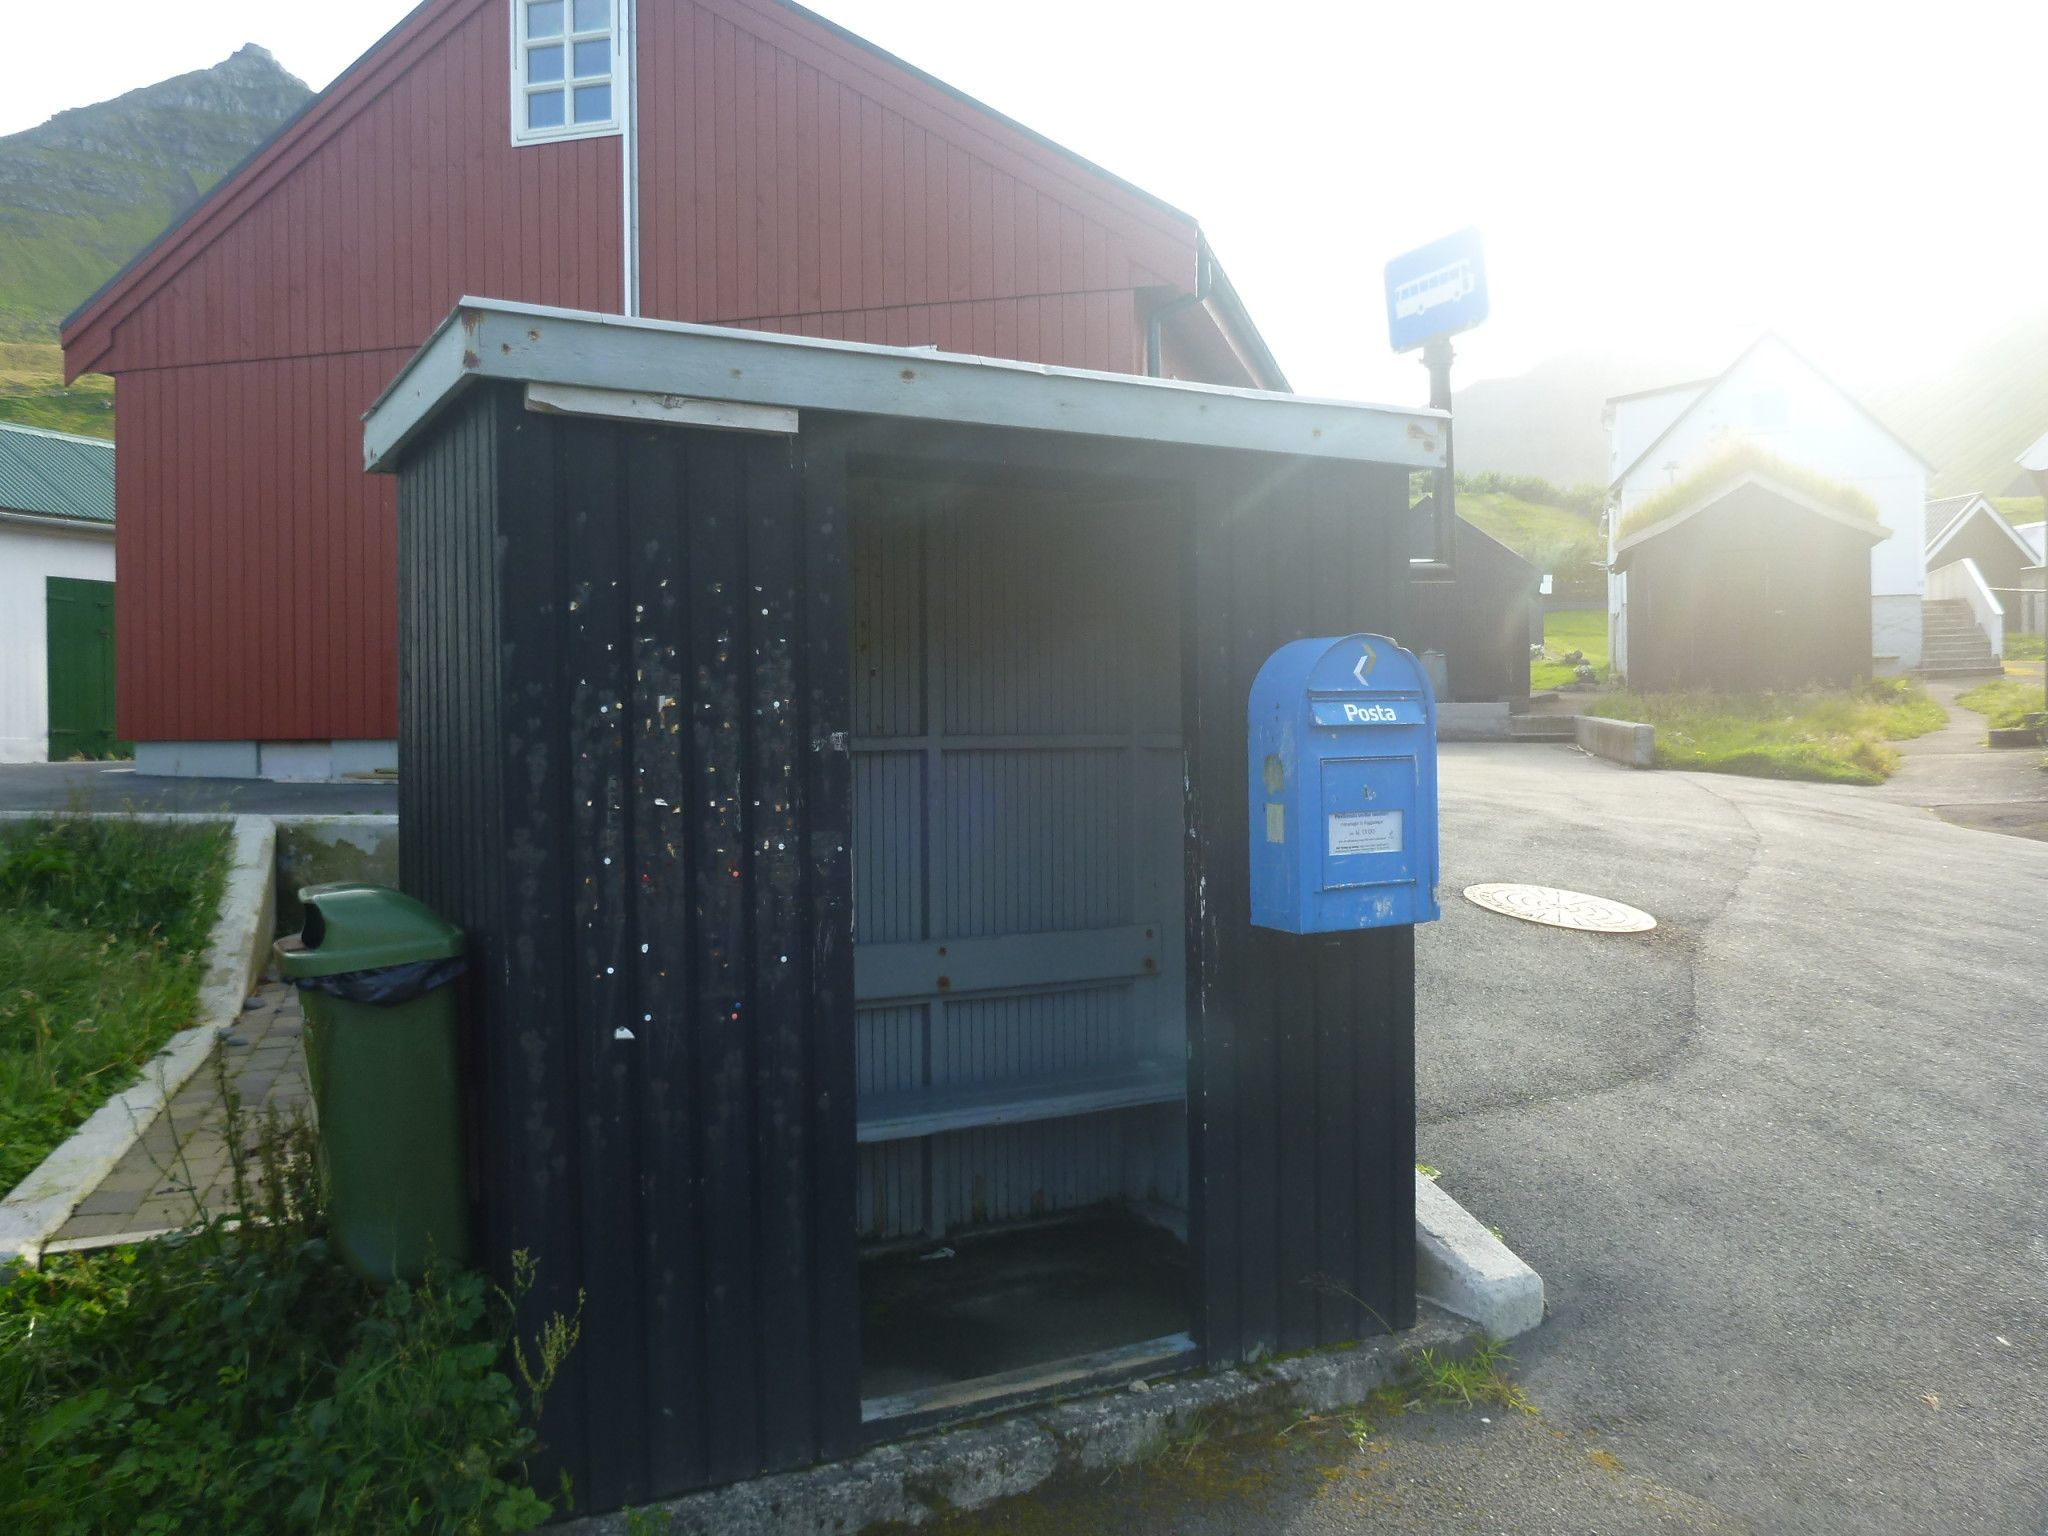 Posta Faroe Islands postbox on the bus stop in Gjógv, Faroe Islands.